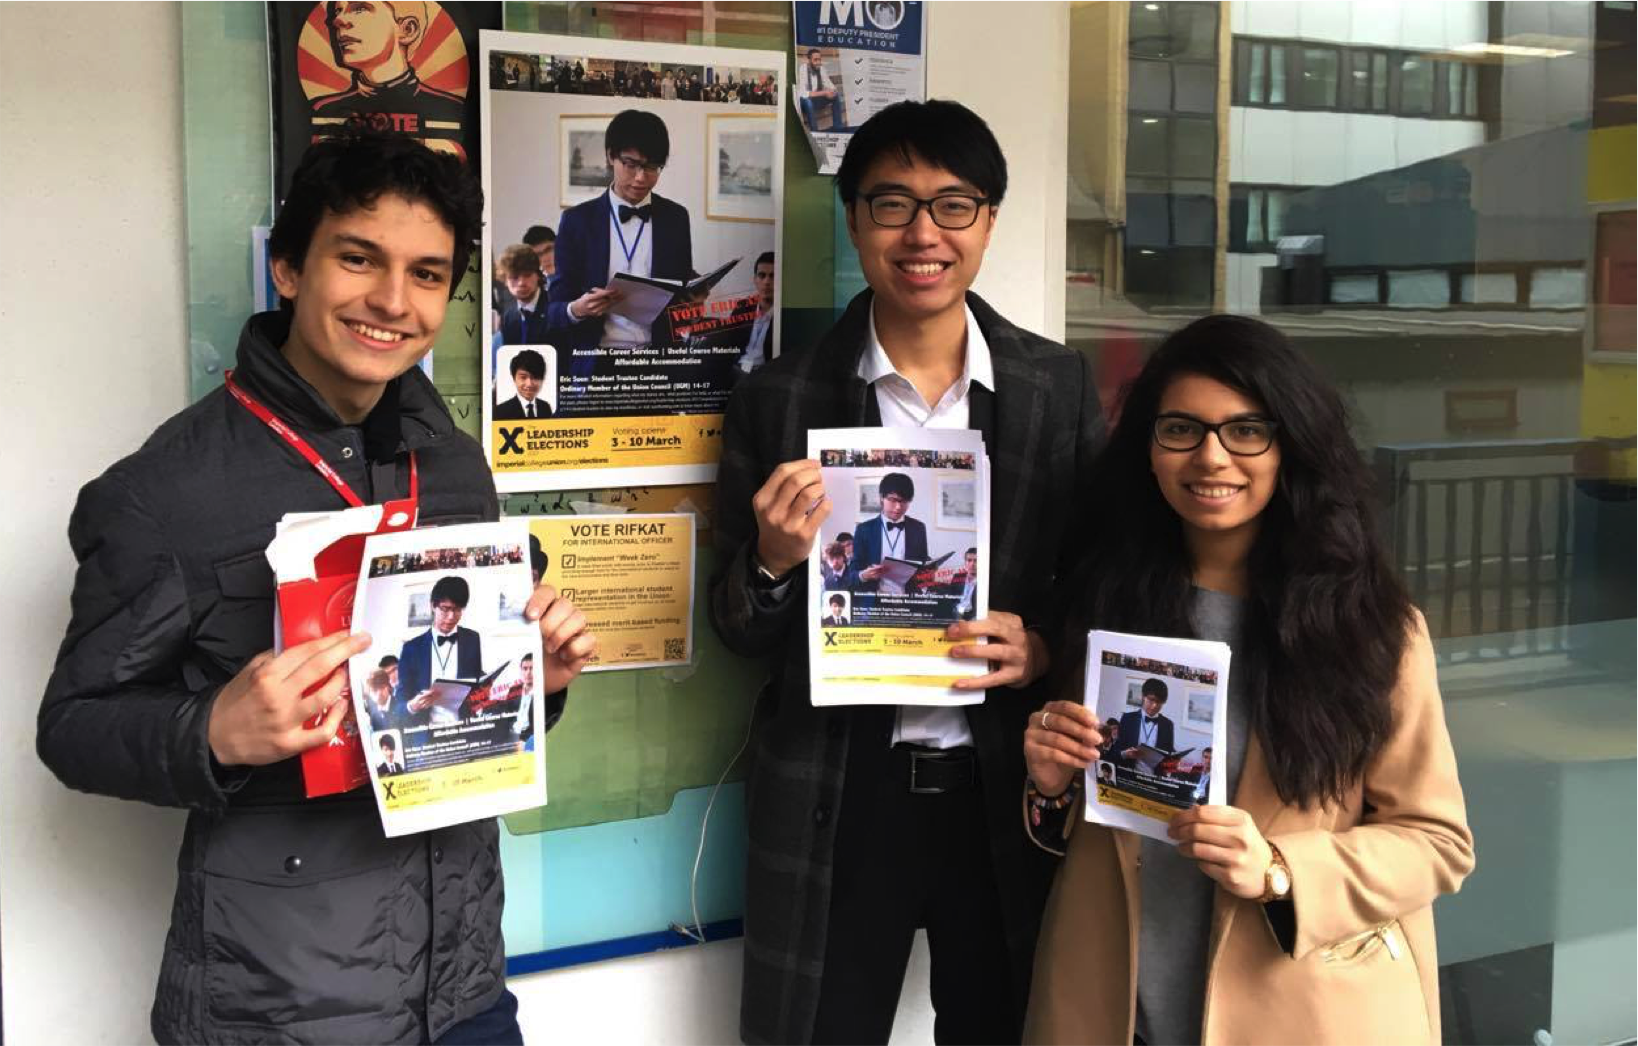 Student Trustee Campaign